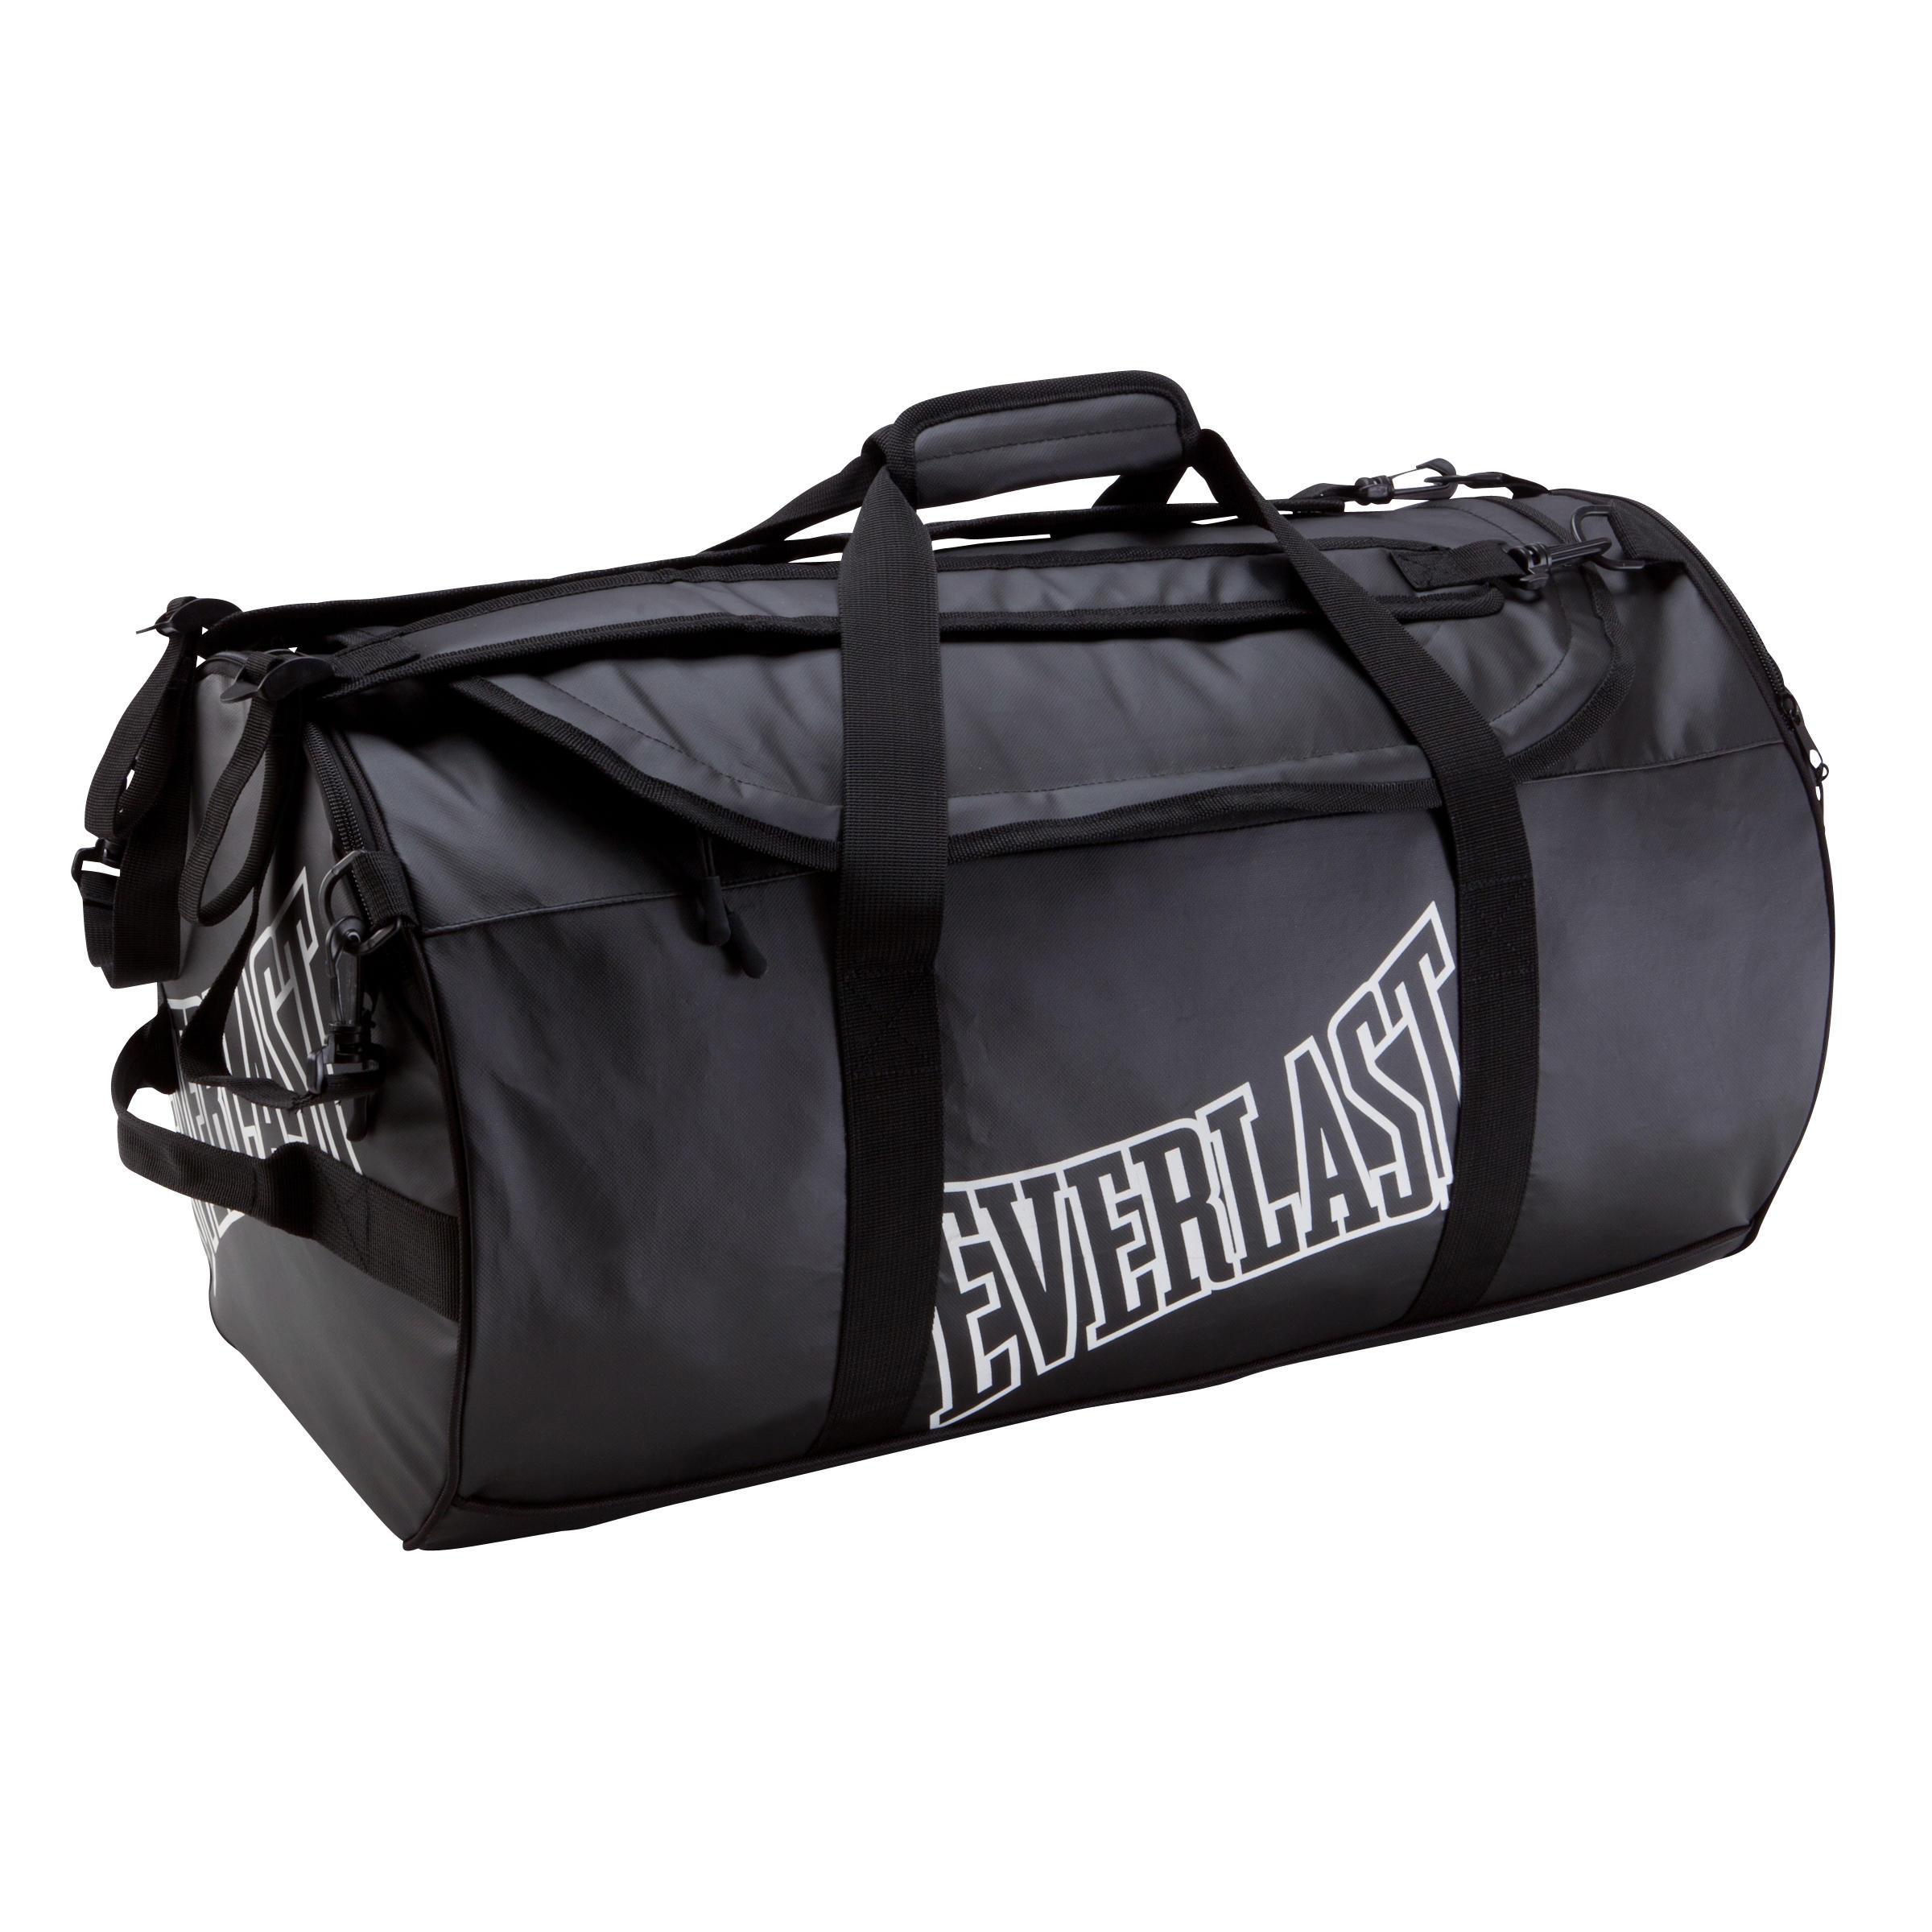 Holdall Sports Bag - Black